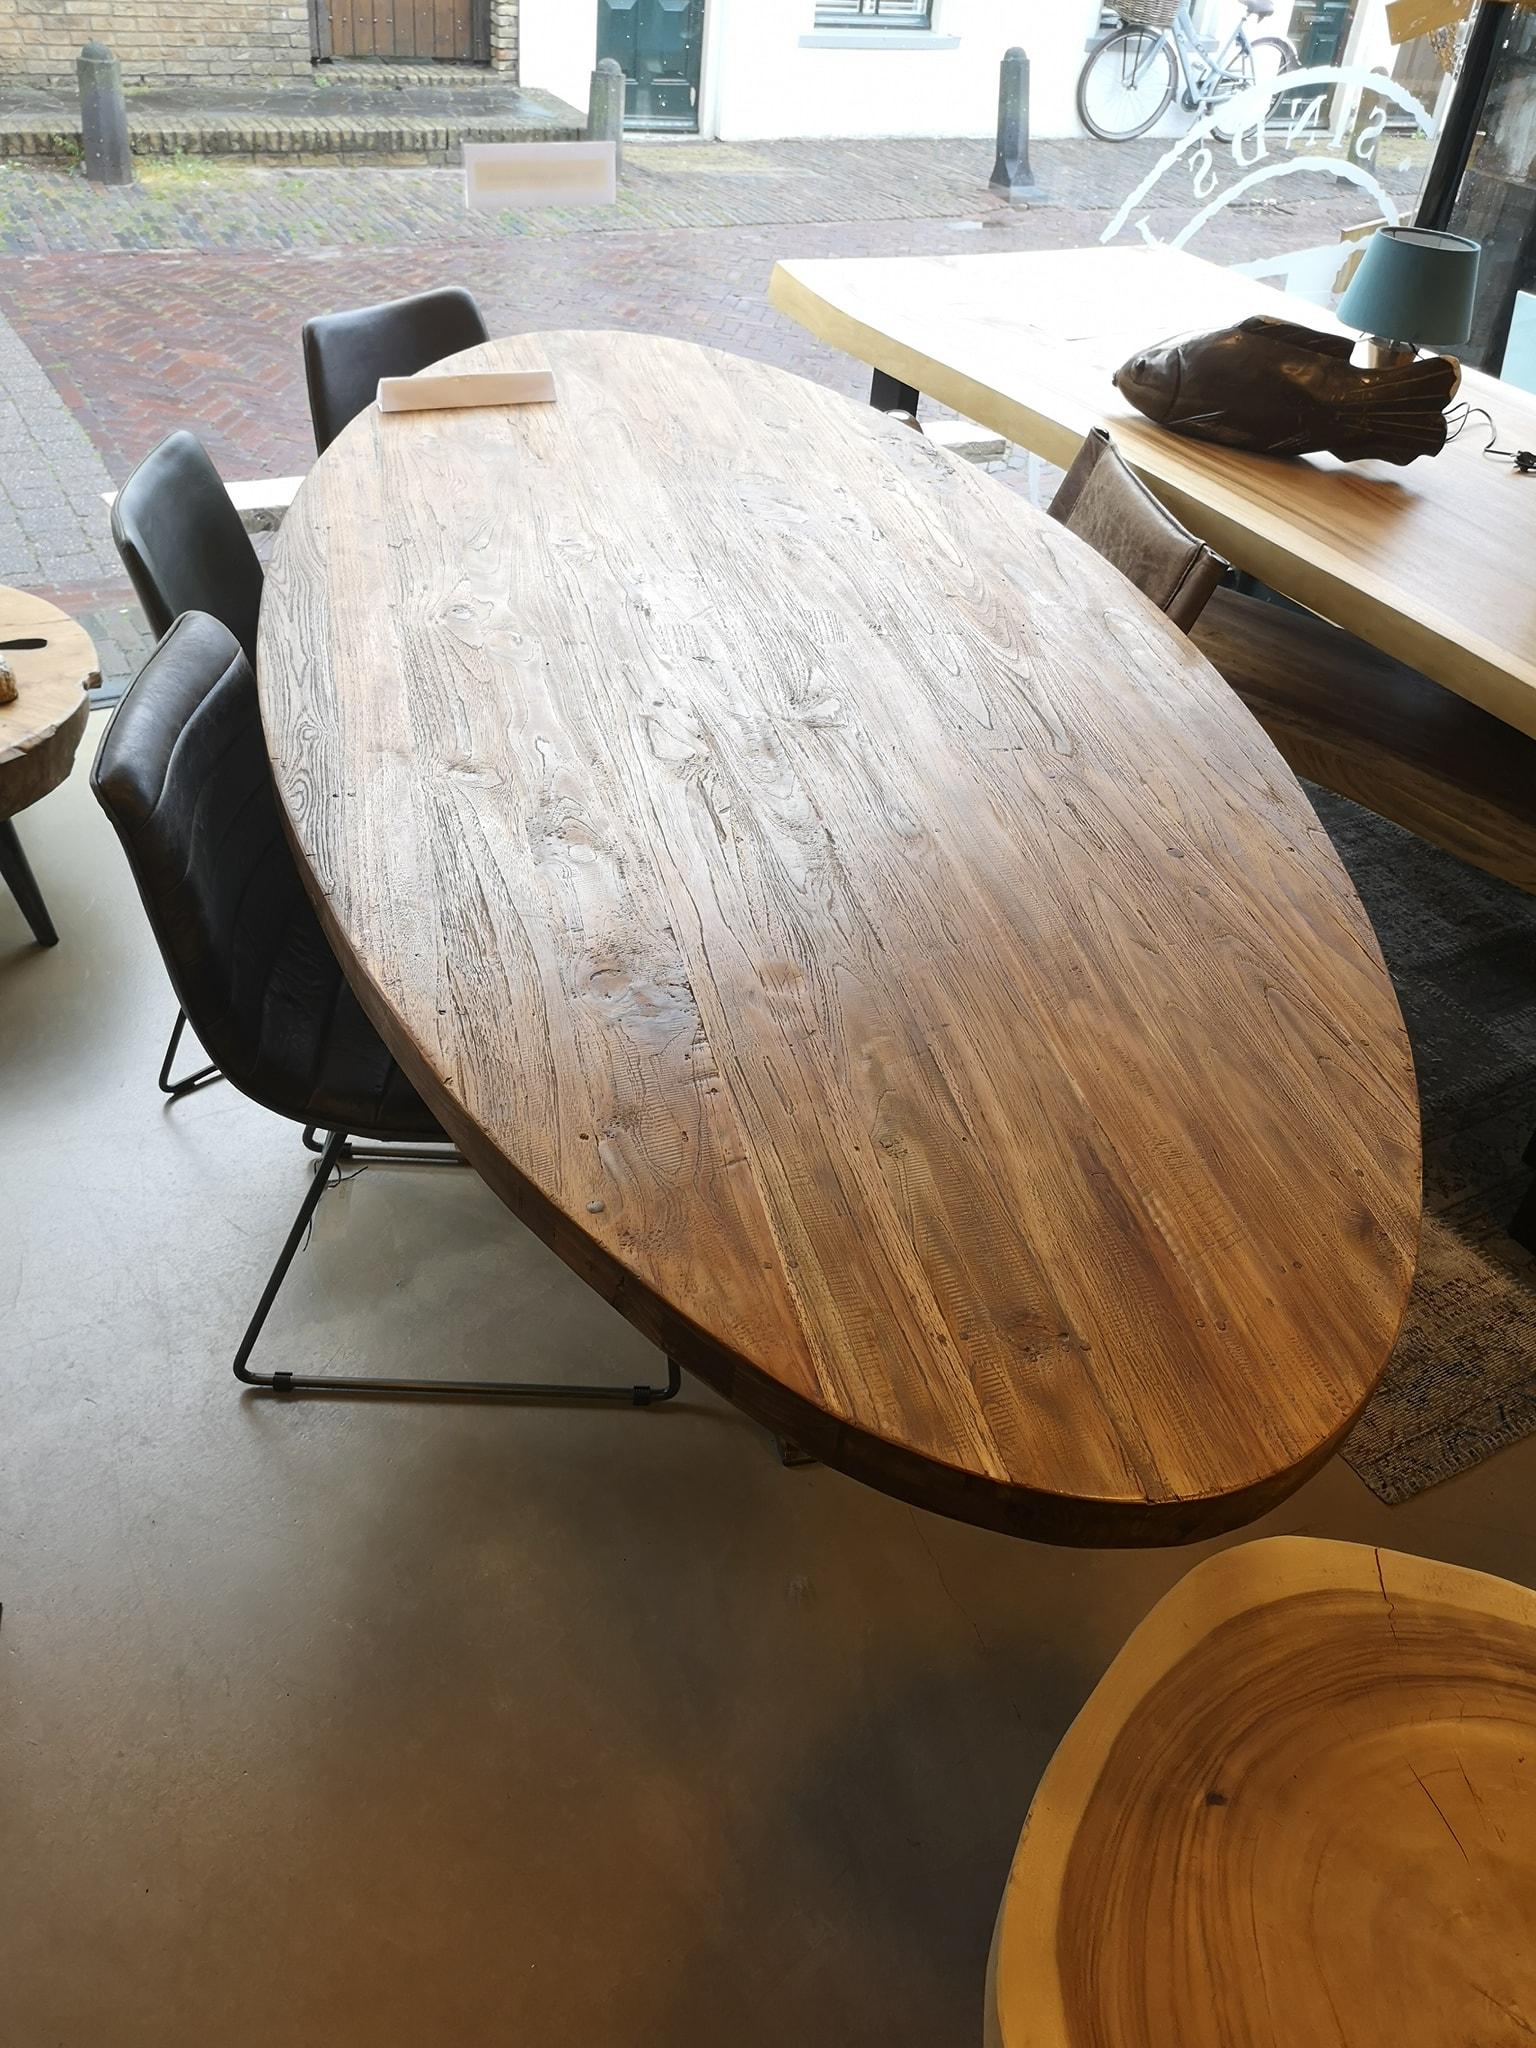 Ovale stoere tafel